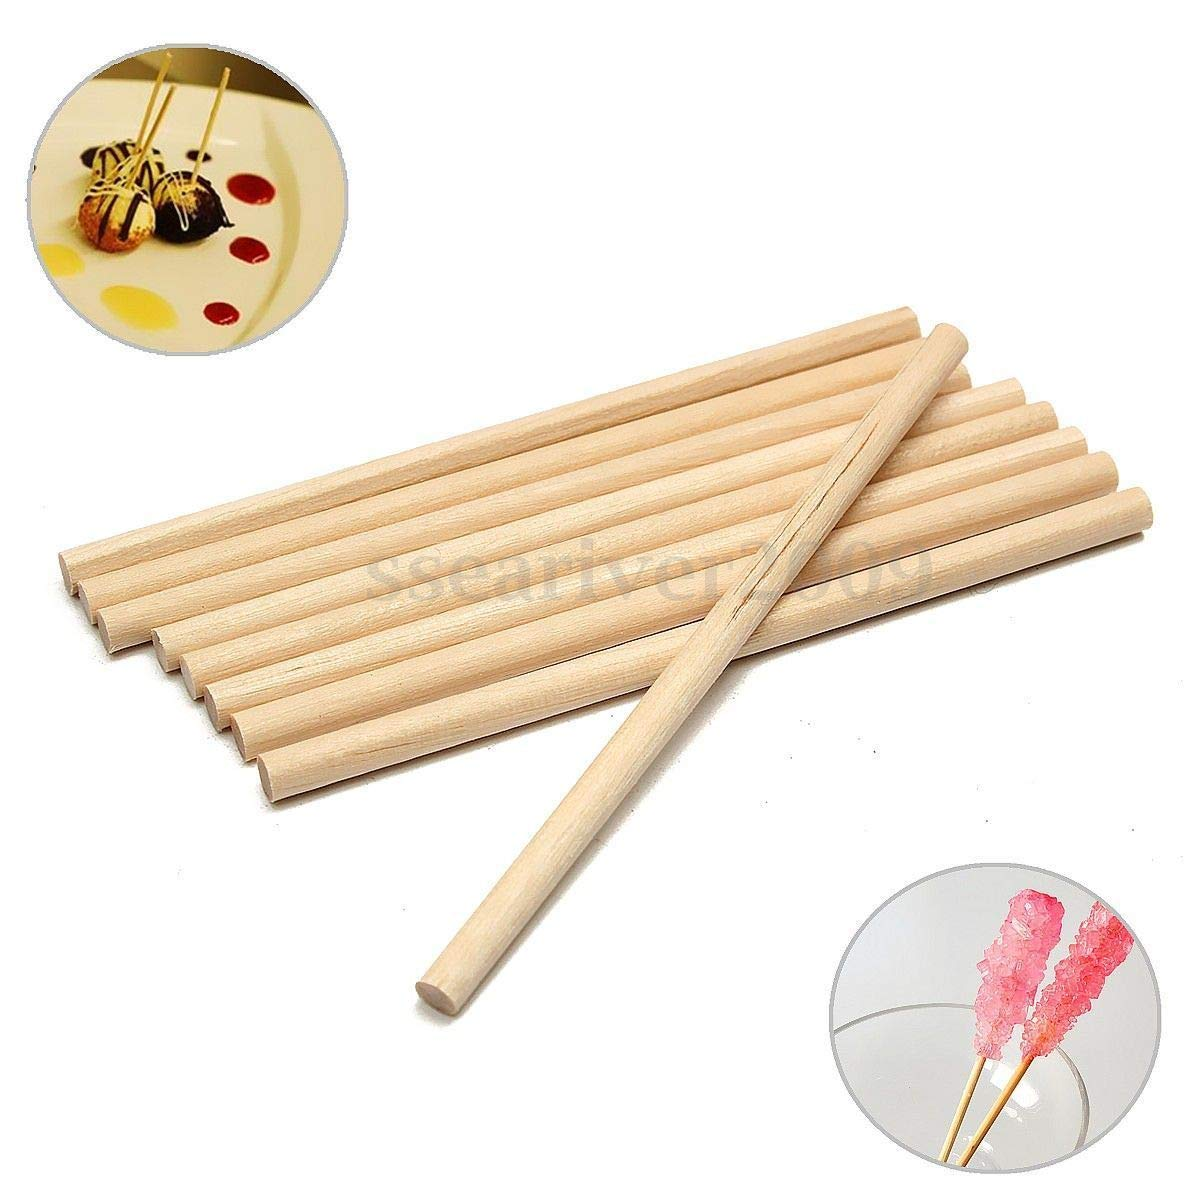 100pcs 100mm Round Wooden Lollipop Lolly Sticks Cake Dowel For DIY Food Craft